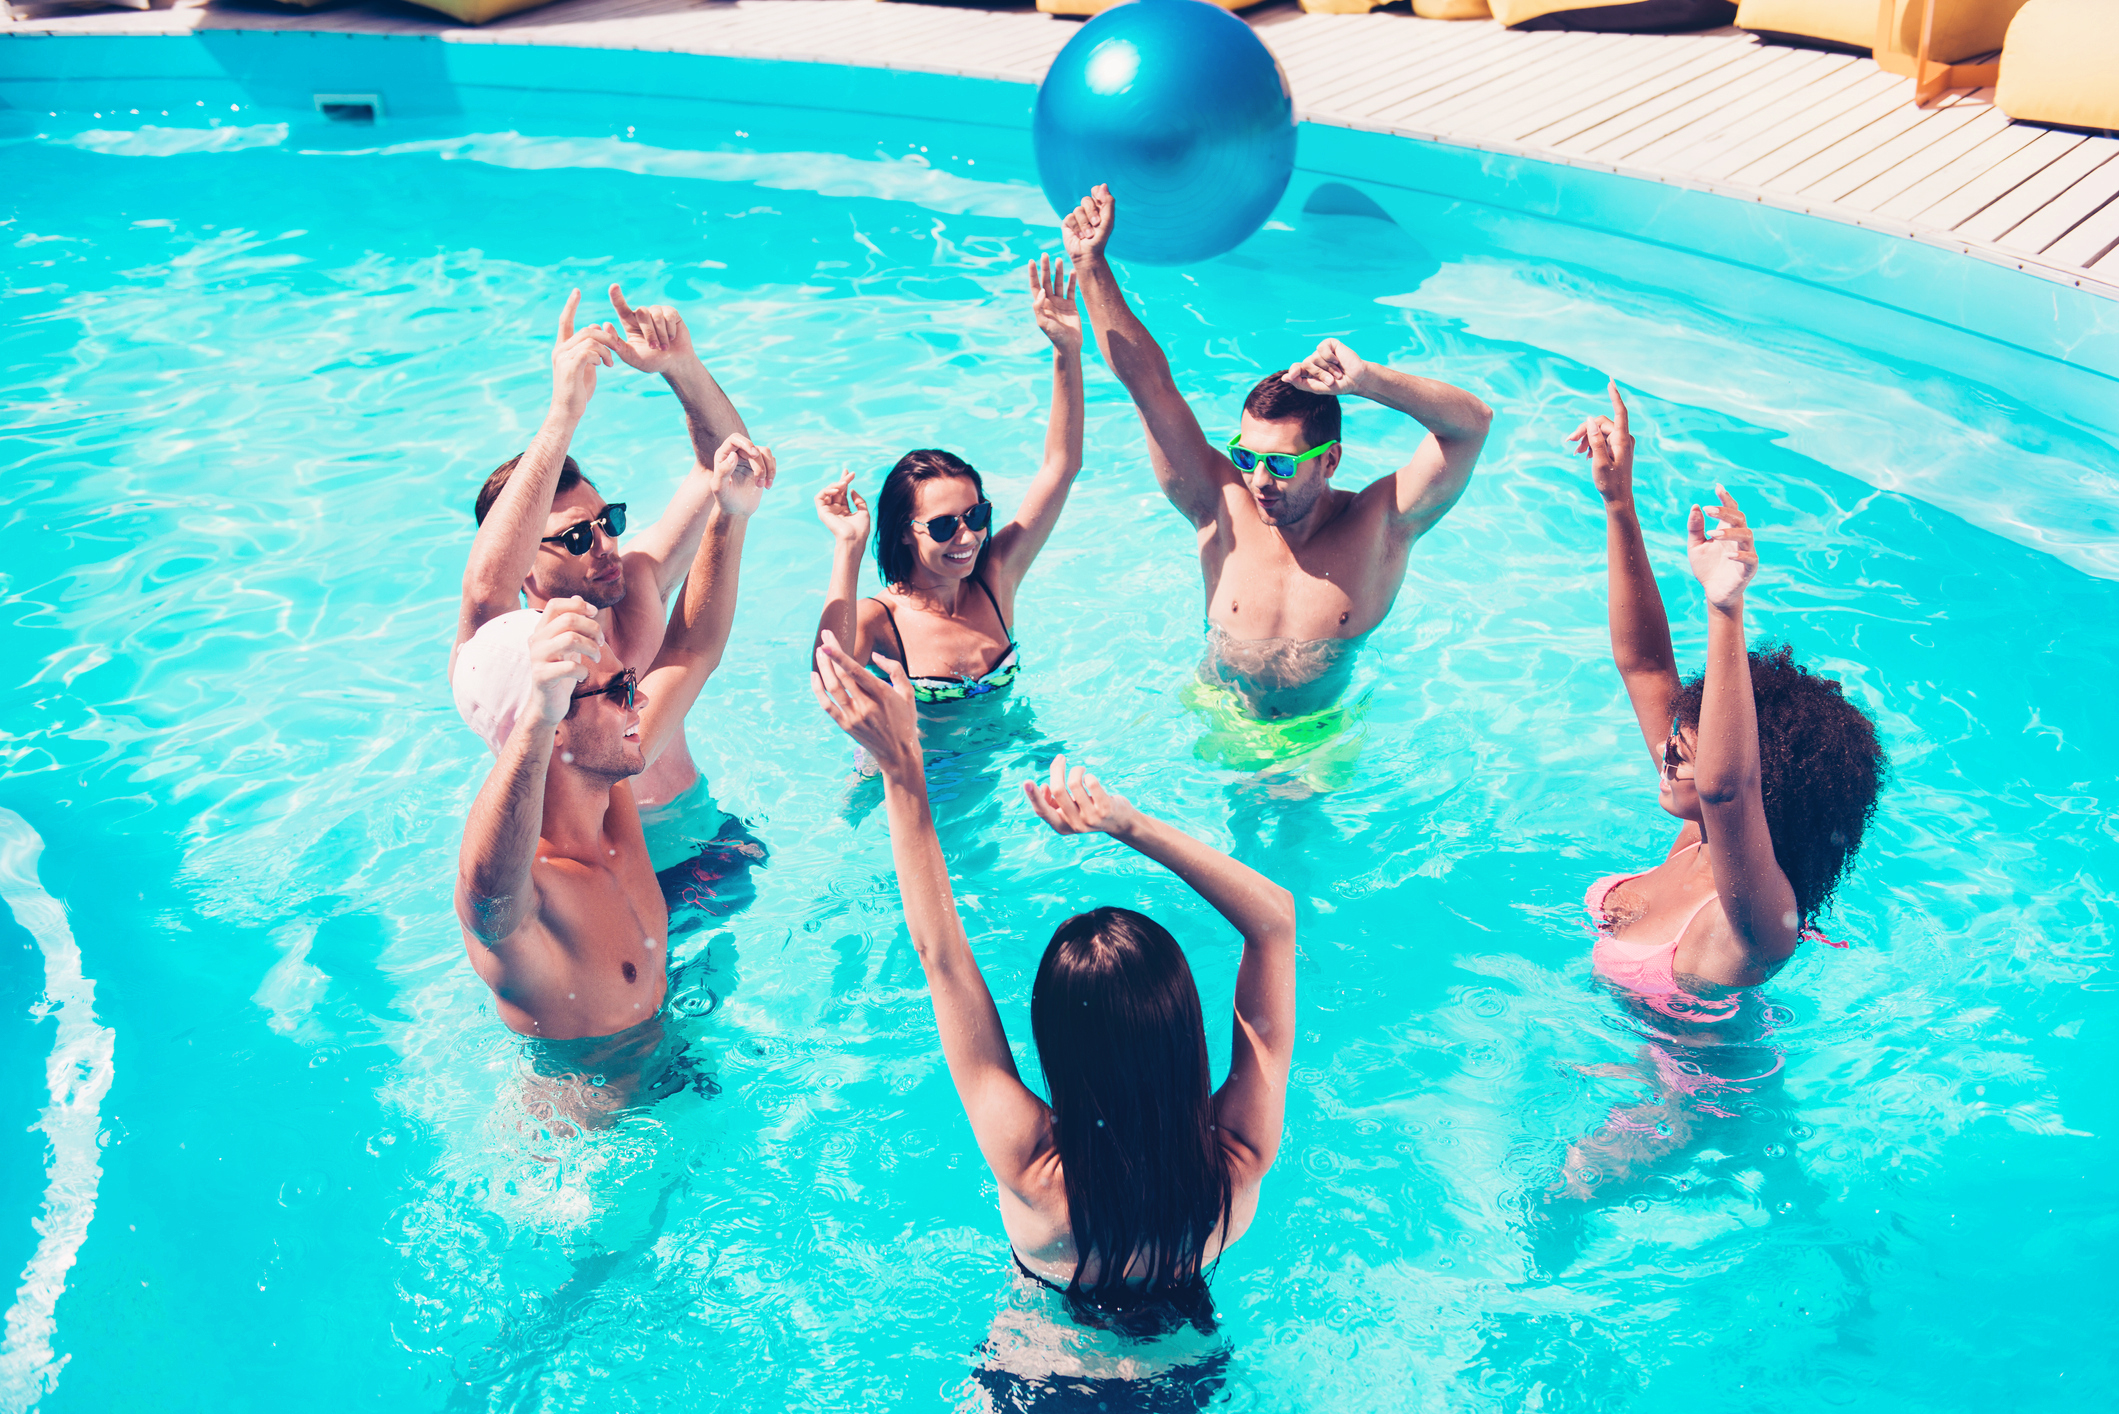 Water Park Swim Pool Party Birthday Party Invitation Add Photo